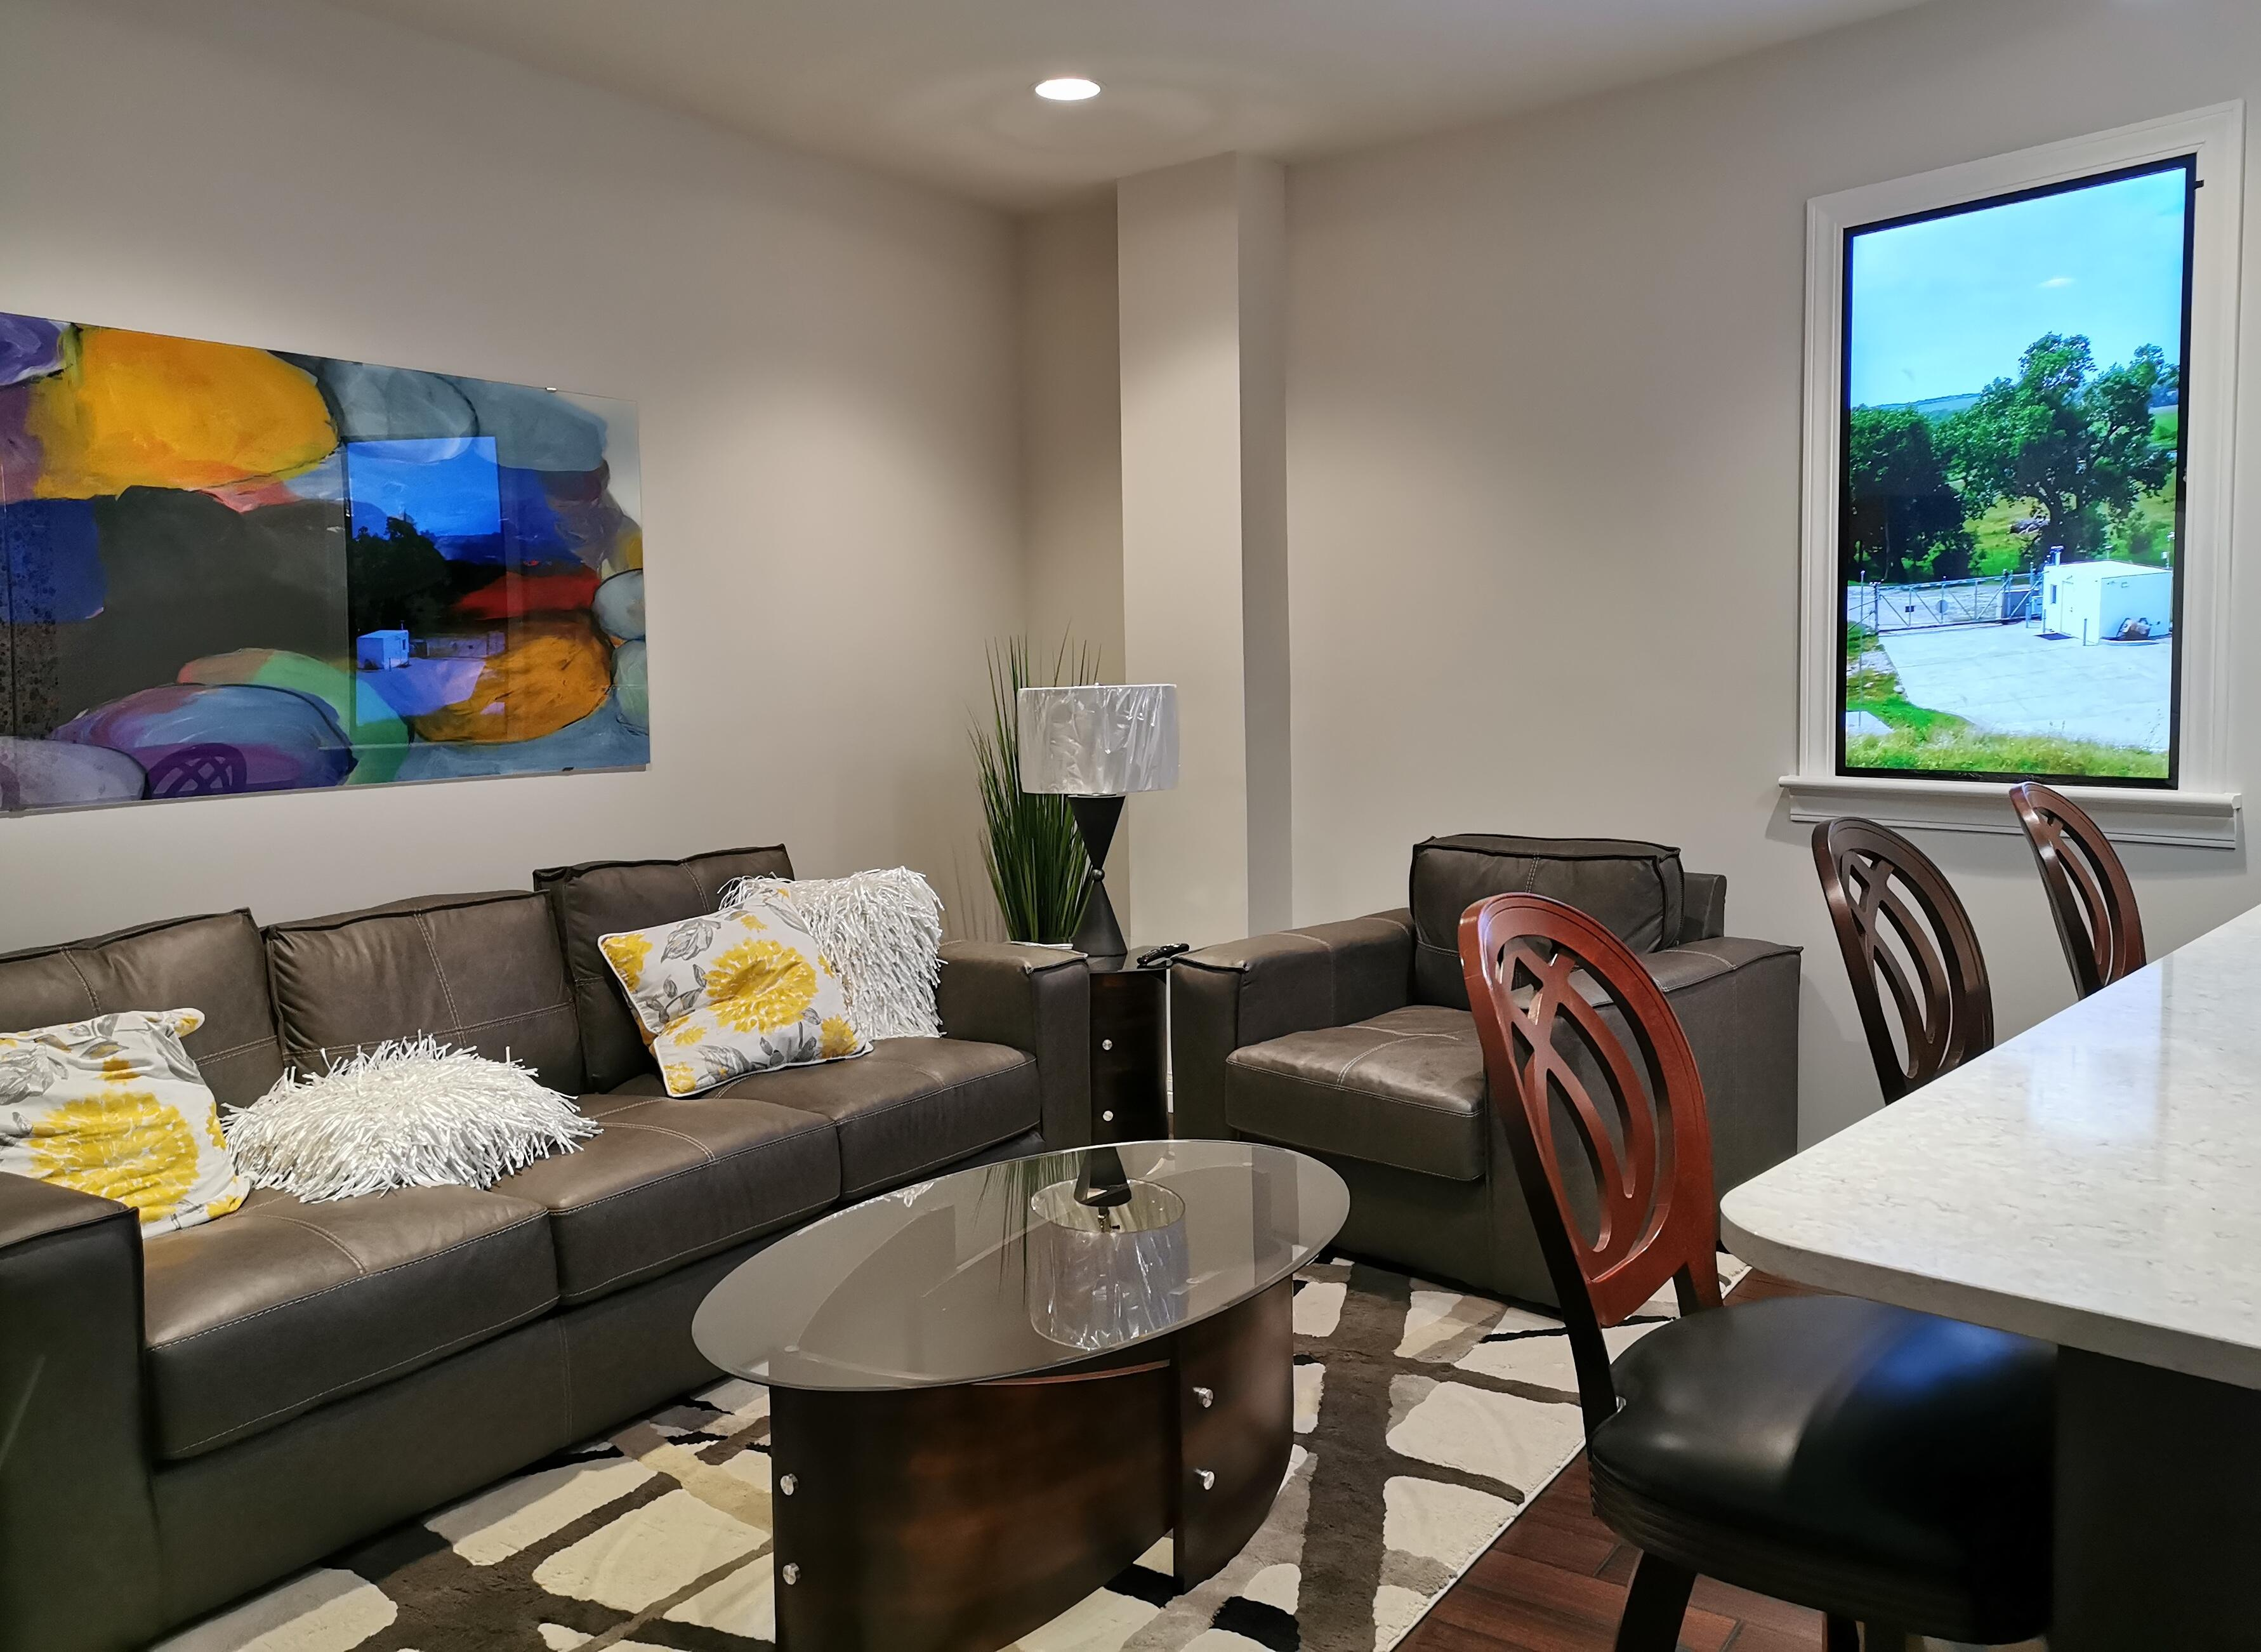 Lounge room in the Survival Condo